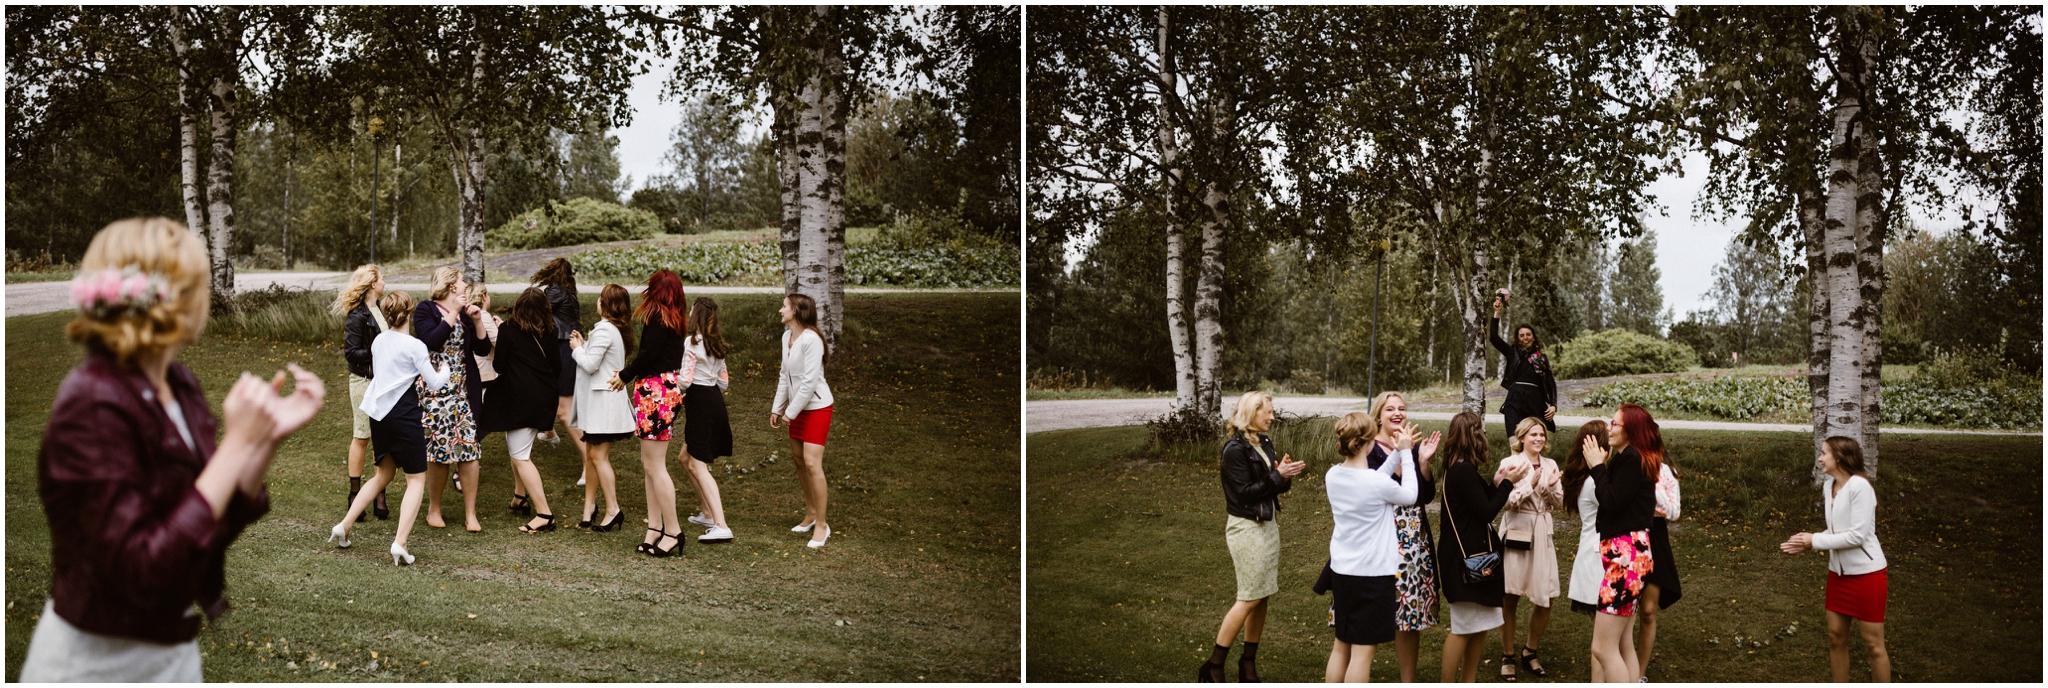 Pinja + Marko -- Patrick Karkkolainen Wedding Photographer-198.jpg